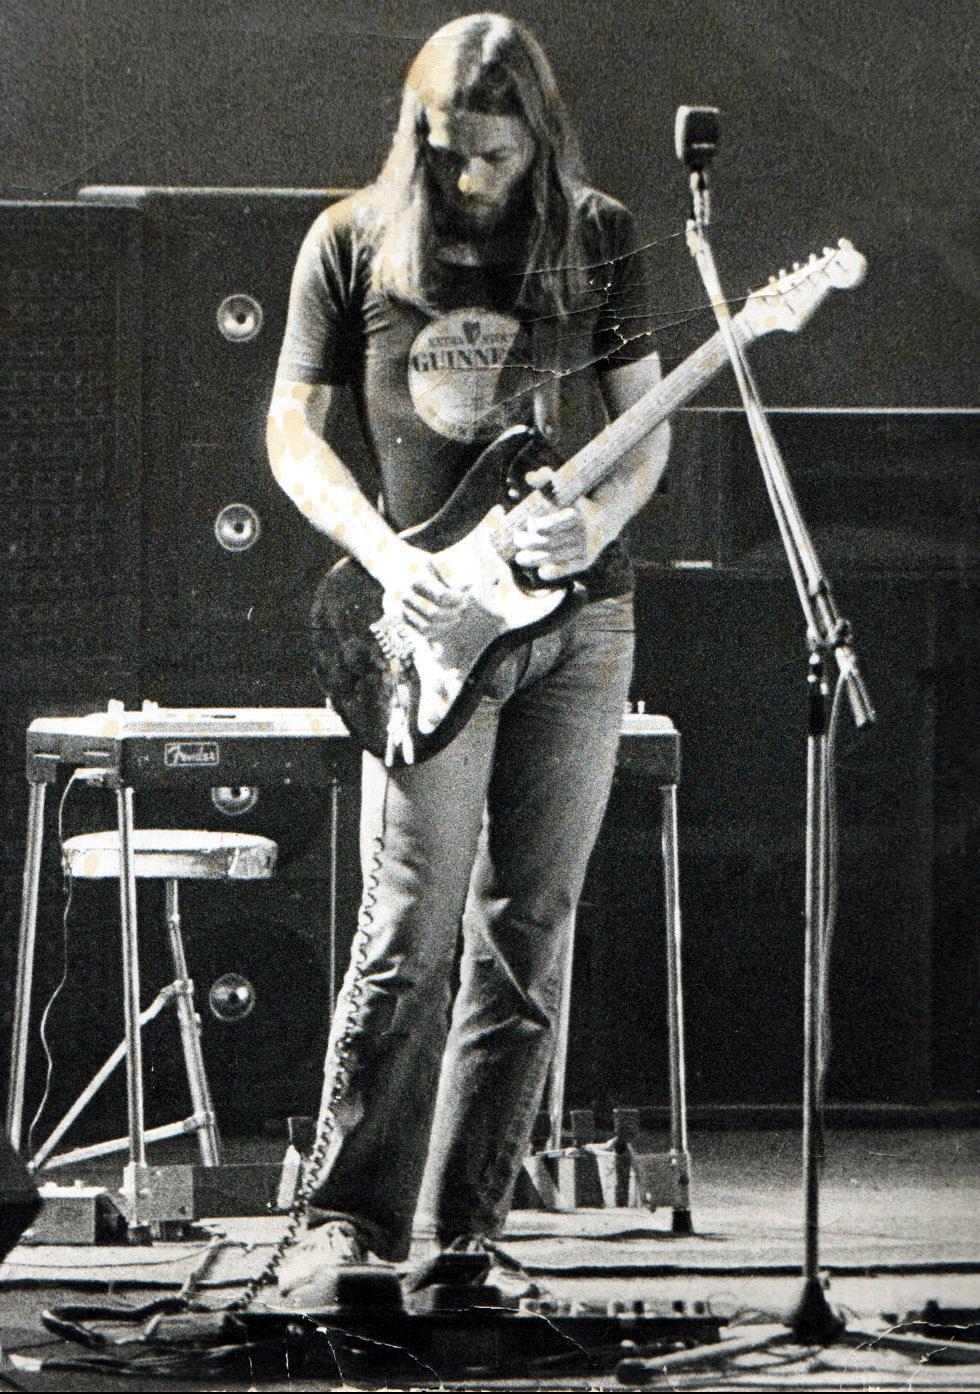 Gilmour.jpg